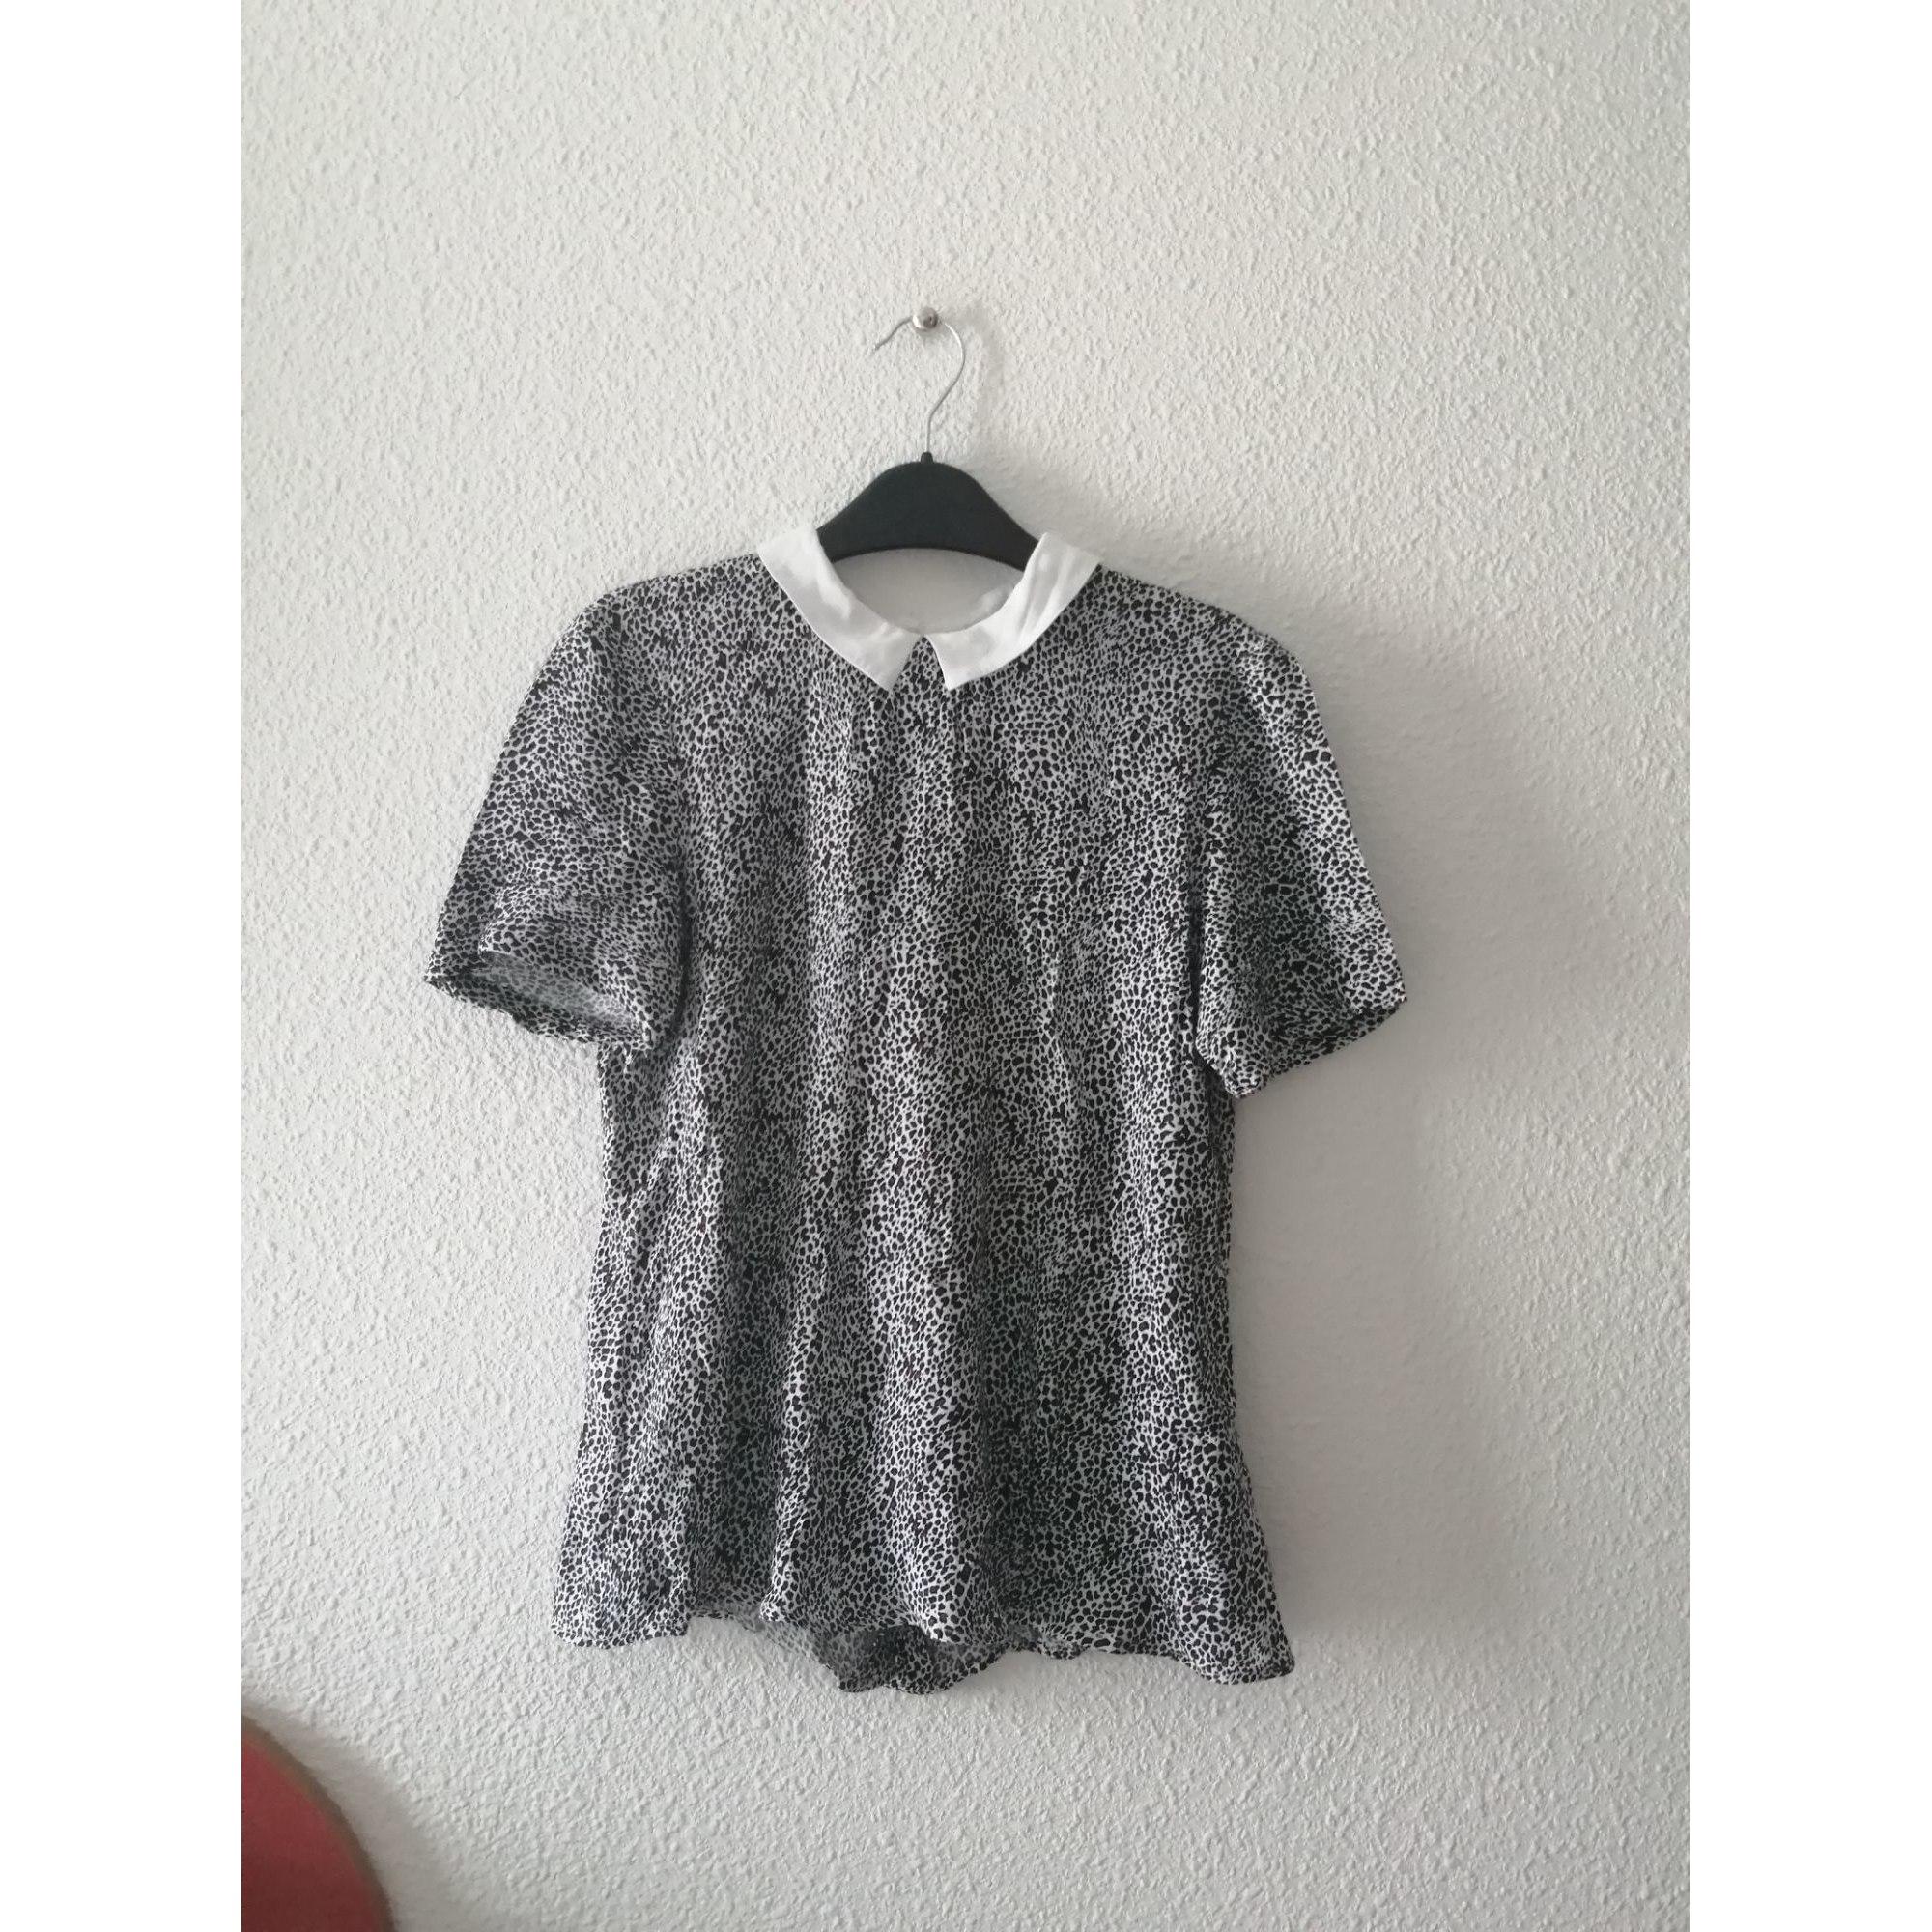 Top, tee-shirt VILA CLOTHES Imprimés animaliers